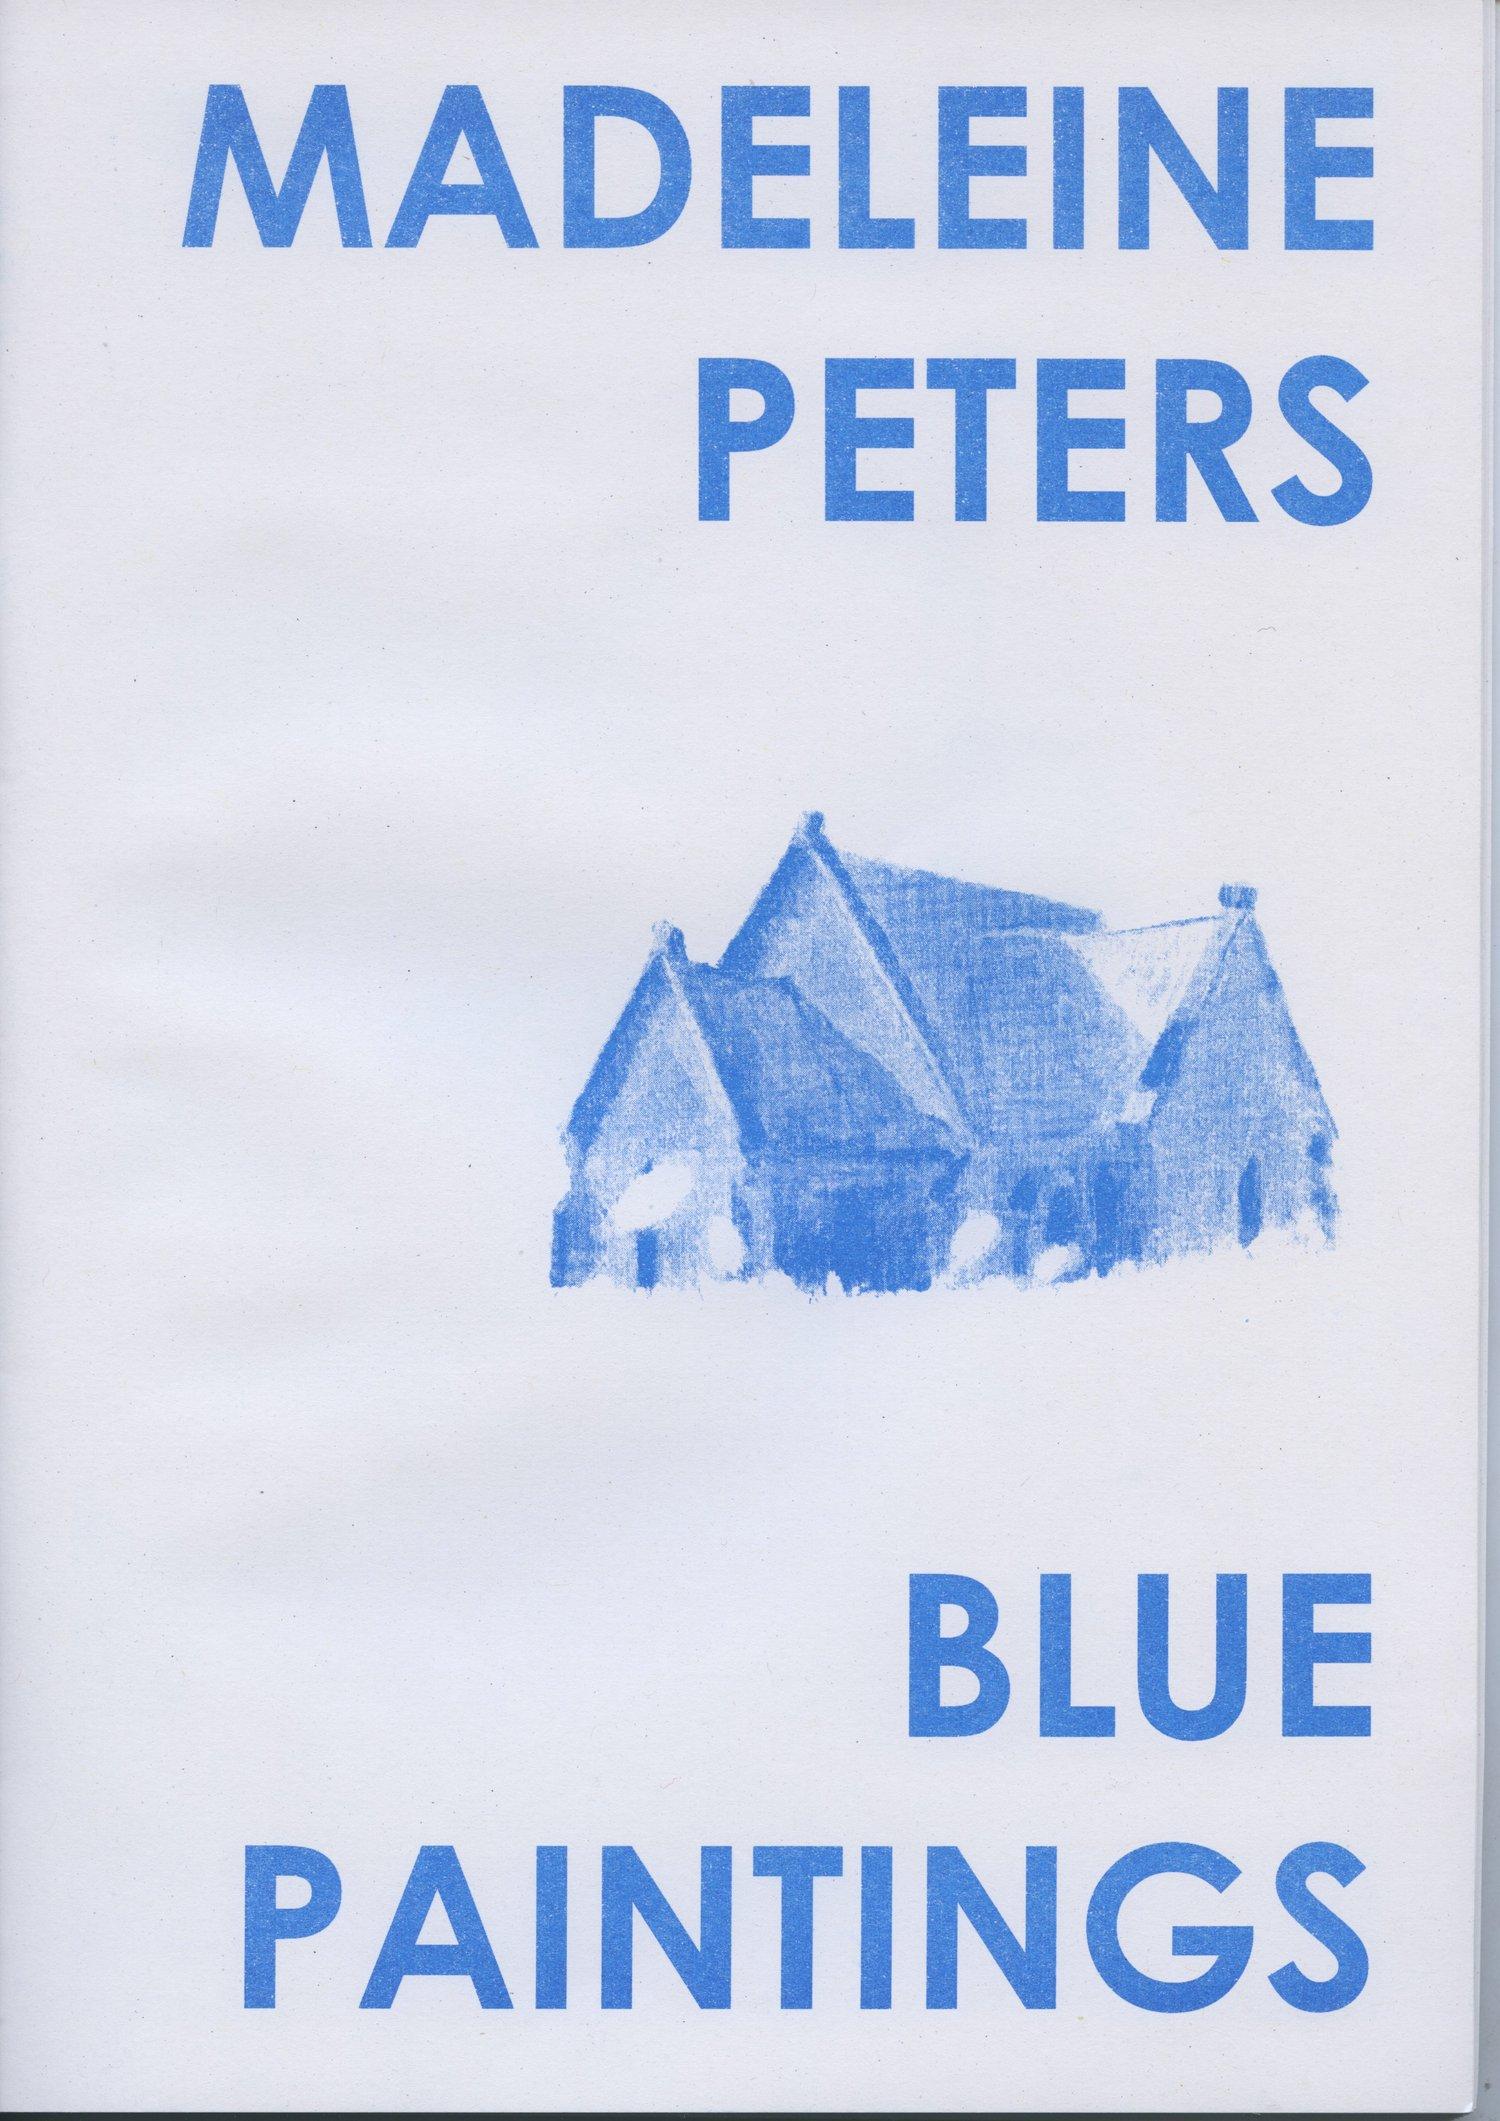 Image of Blue Paintings – Madeleine Peters